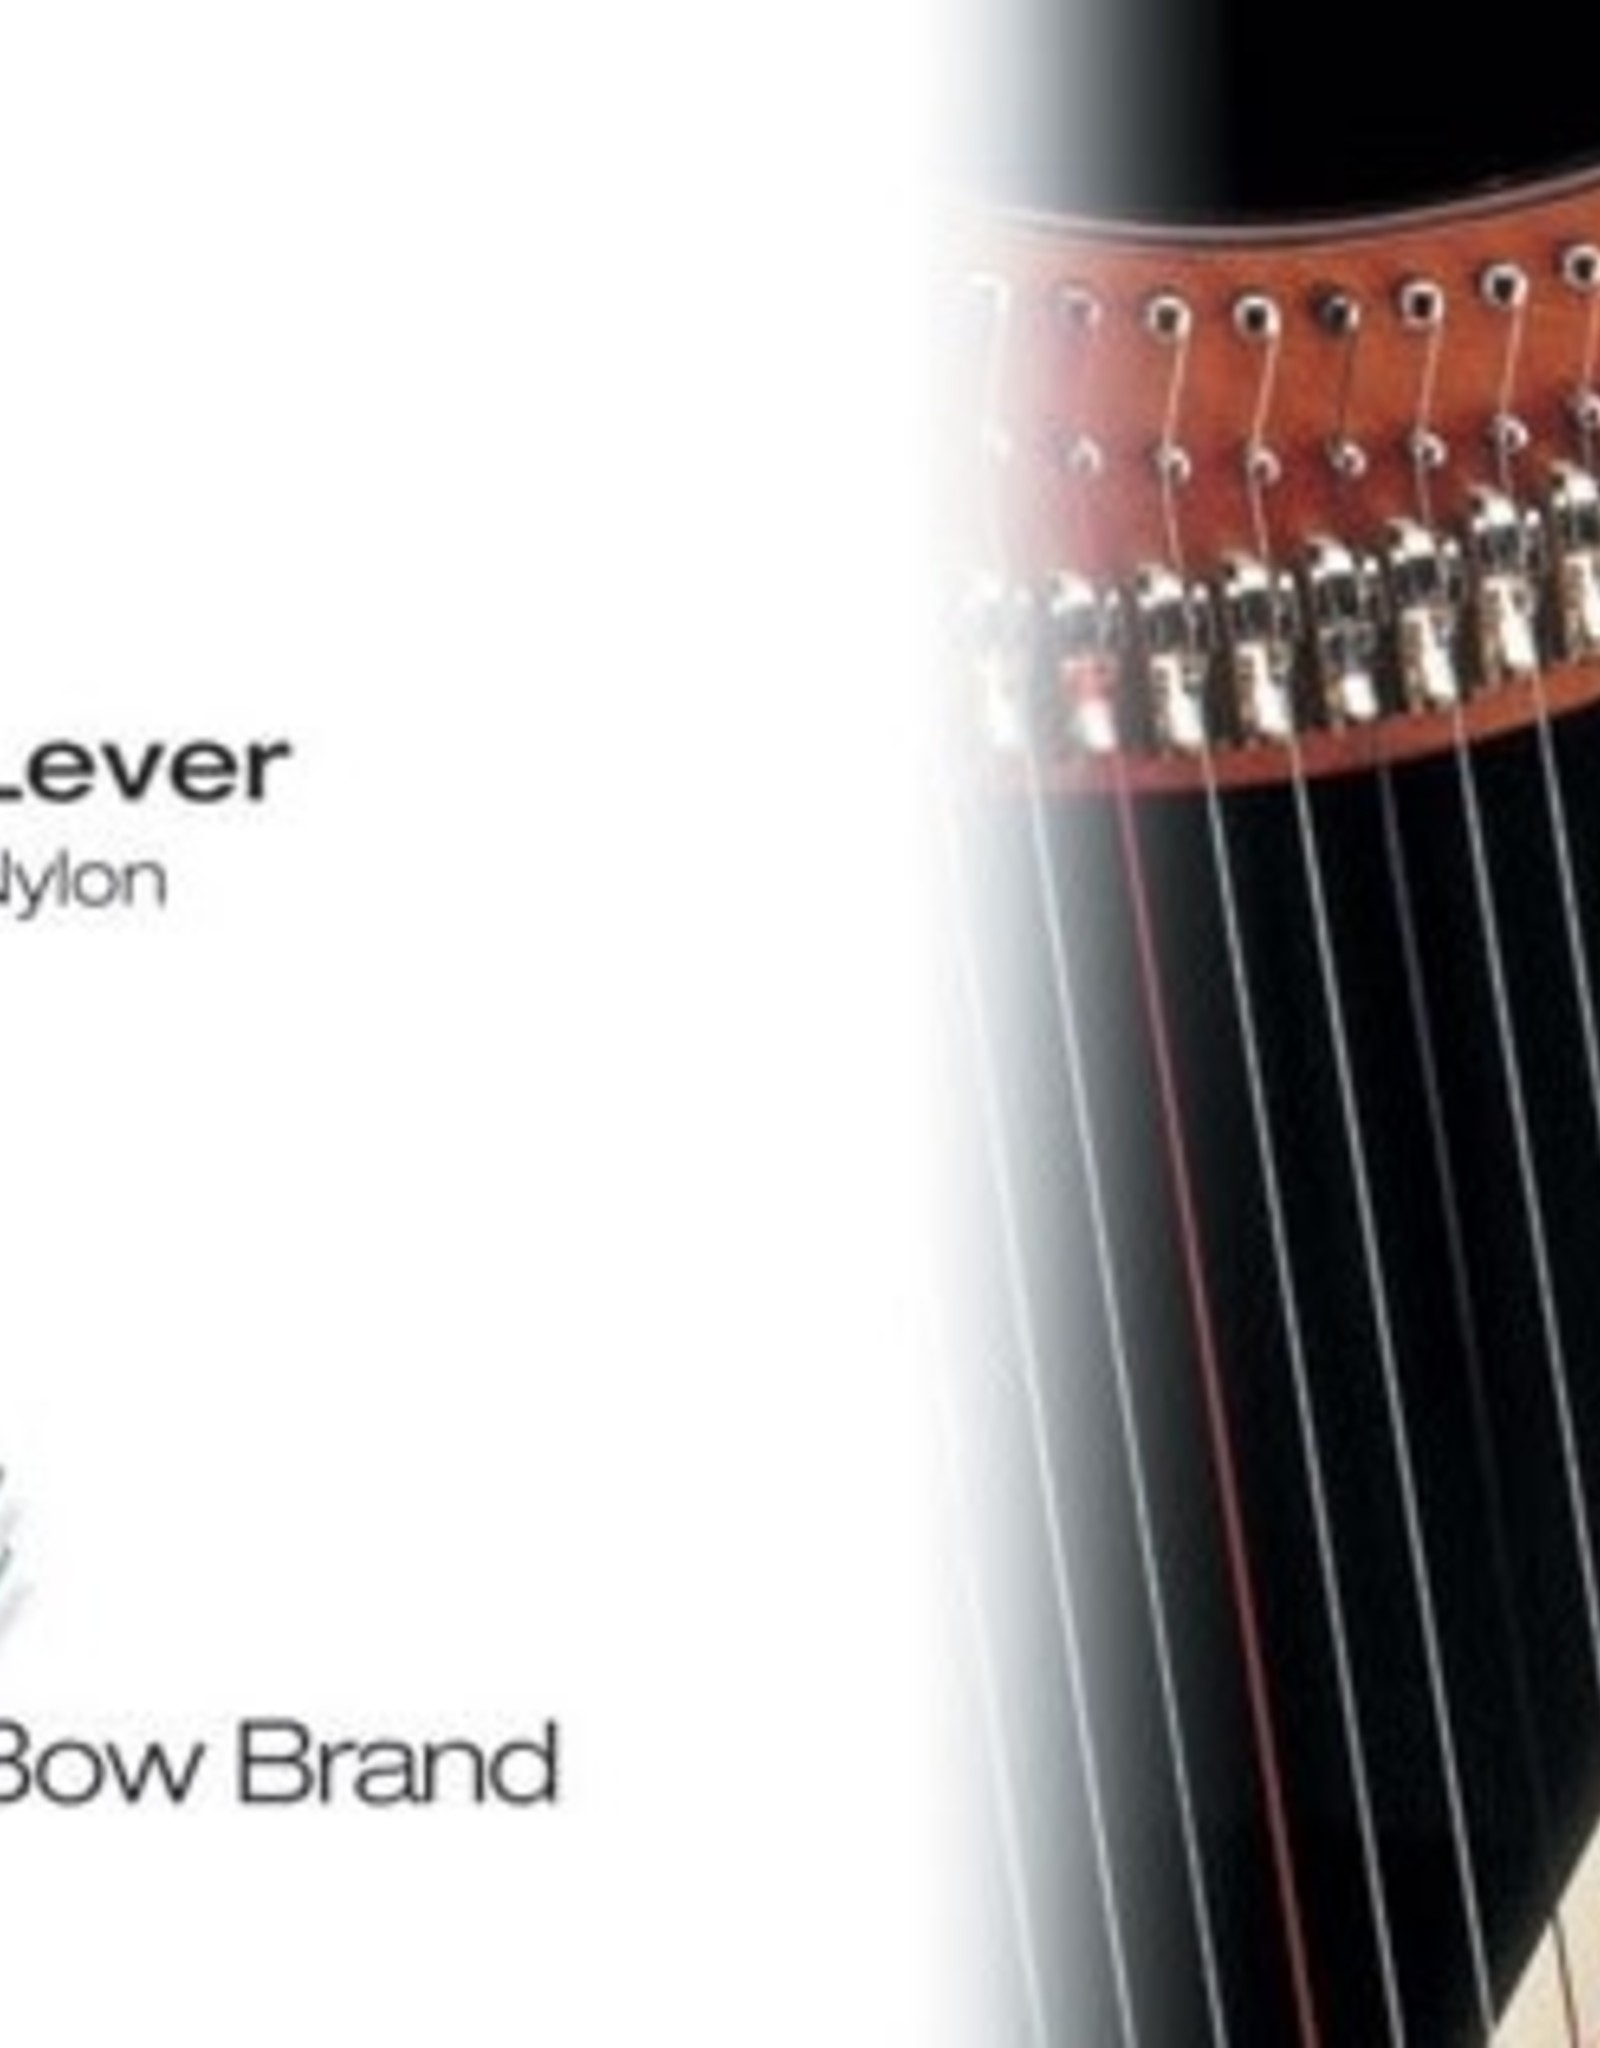 BOW BRAND  klep nylon - lever NYLON 24/4 do